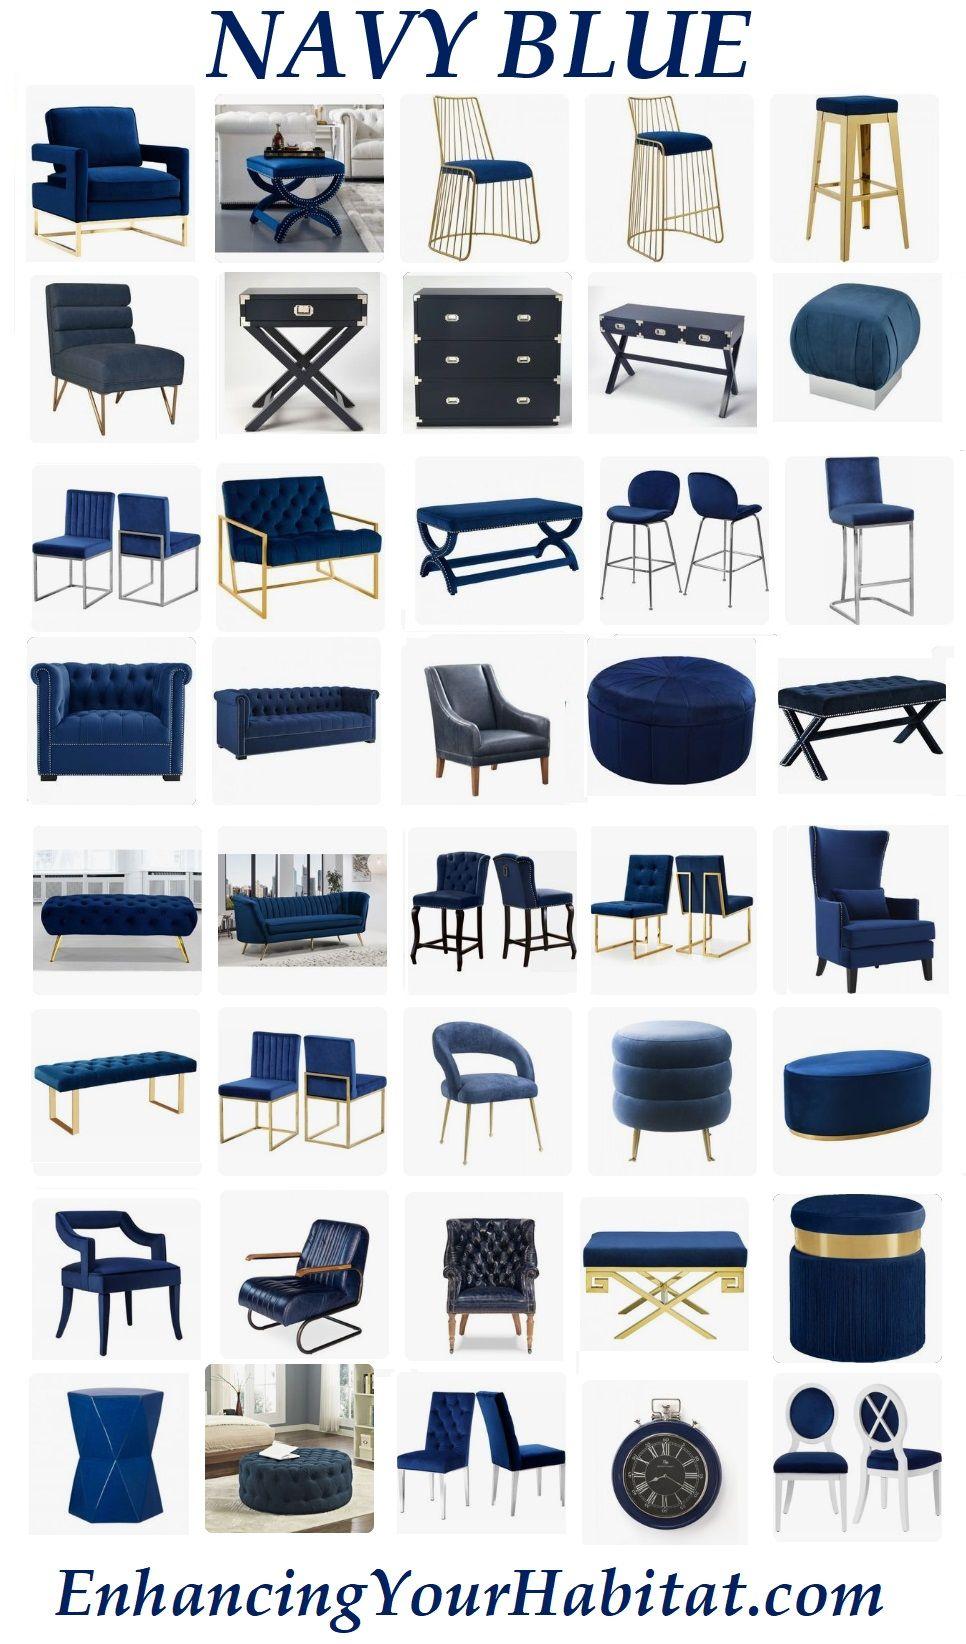 Navy Blue Furniture Navy Blue Velvet Navy Blue Leather Navy Blue Fabric Navy Blu…